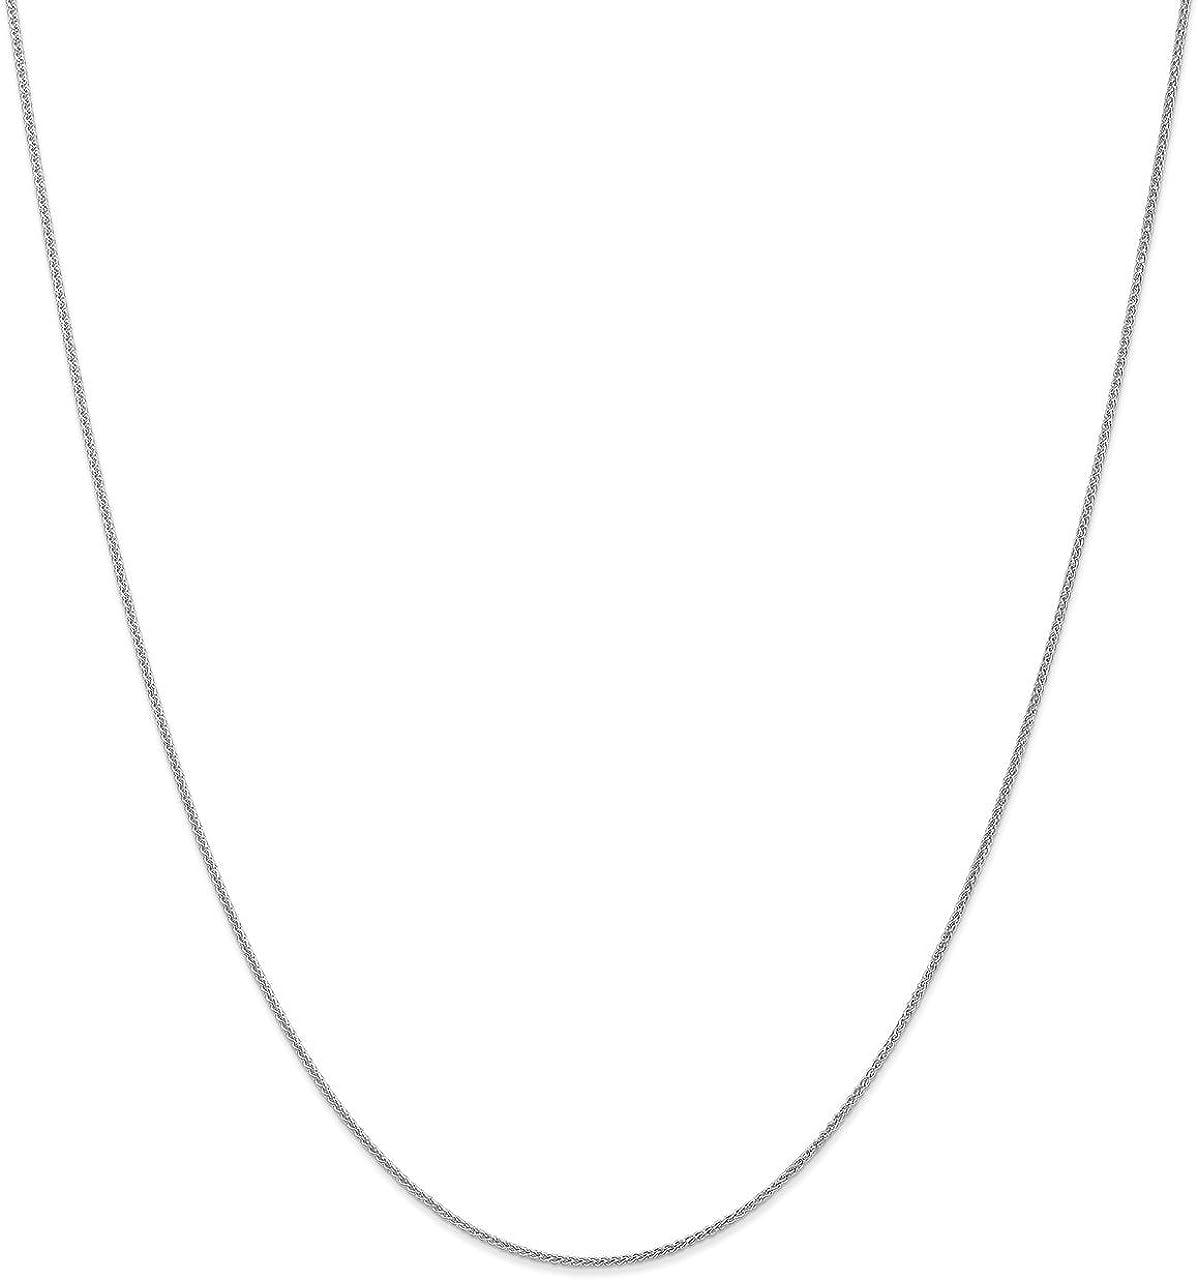 Lex /& Lu 10k White Gold 1mm Spiga Pendant Chain Necklace